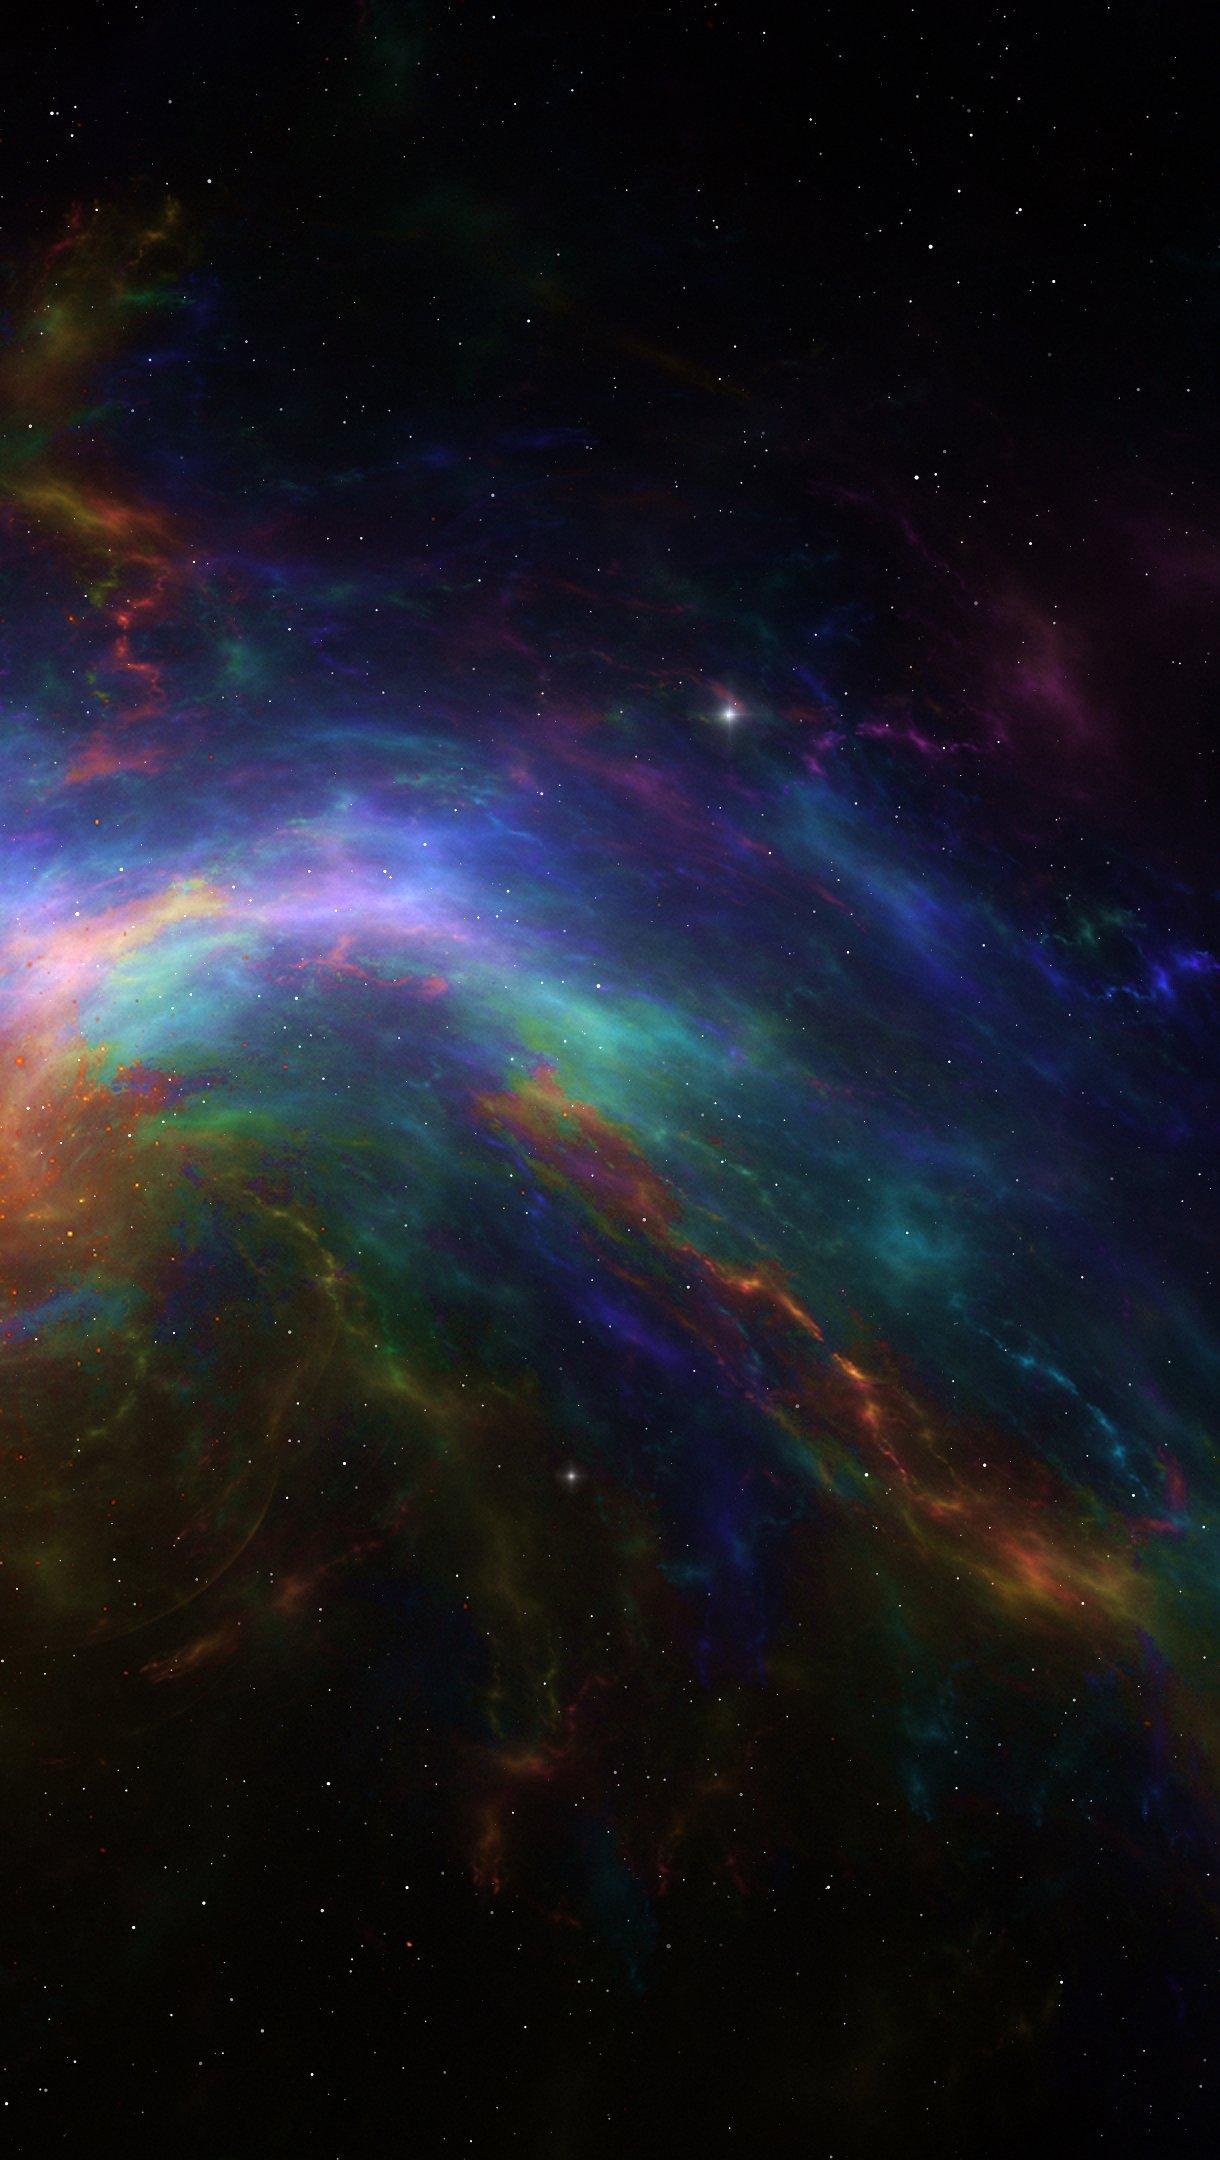 Fondos de pantalla Nebula colorida Vertical